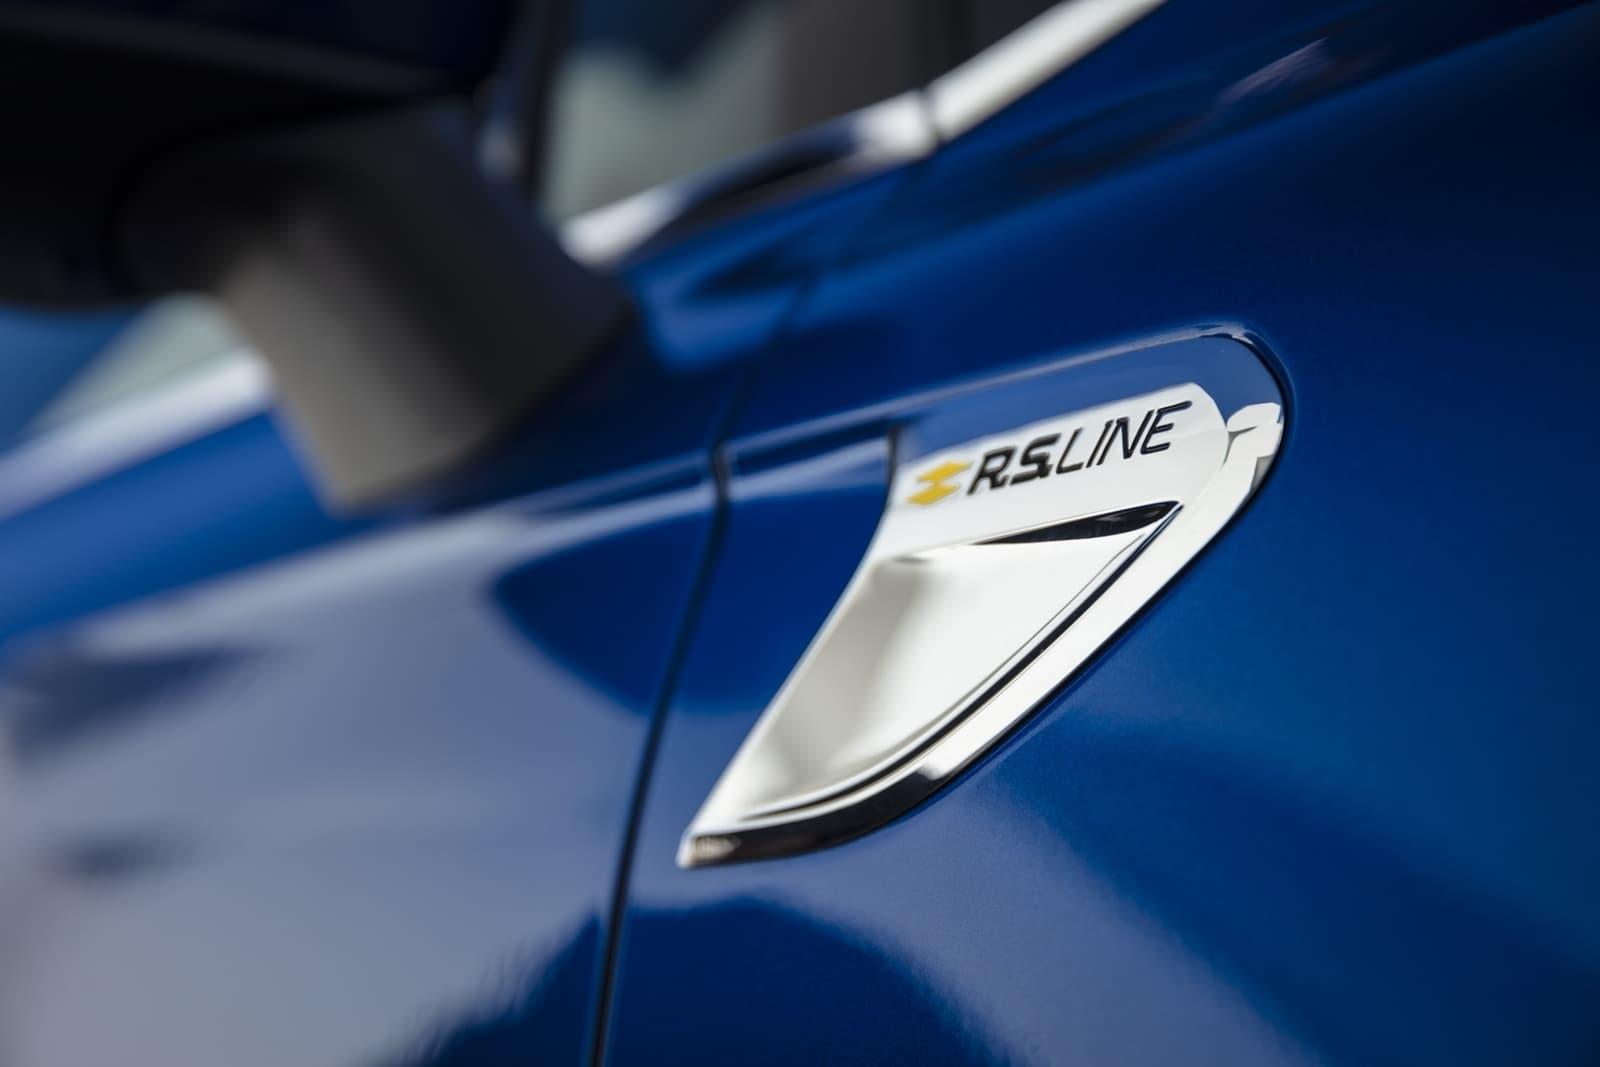 Renault Clio 2020 Prueba 0619 040